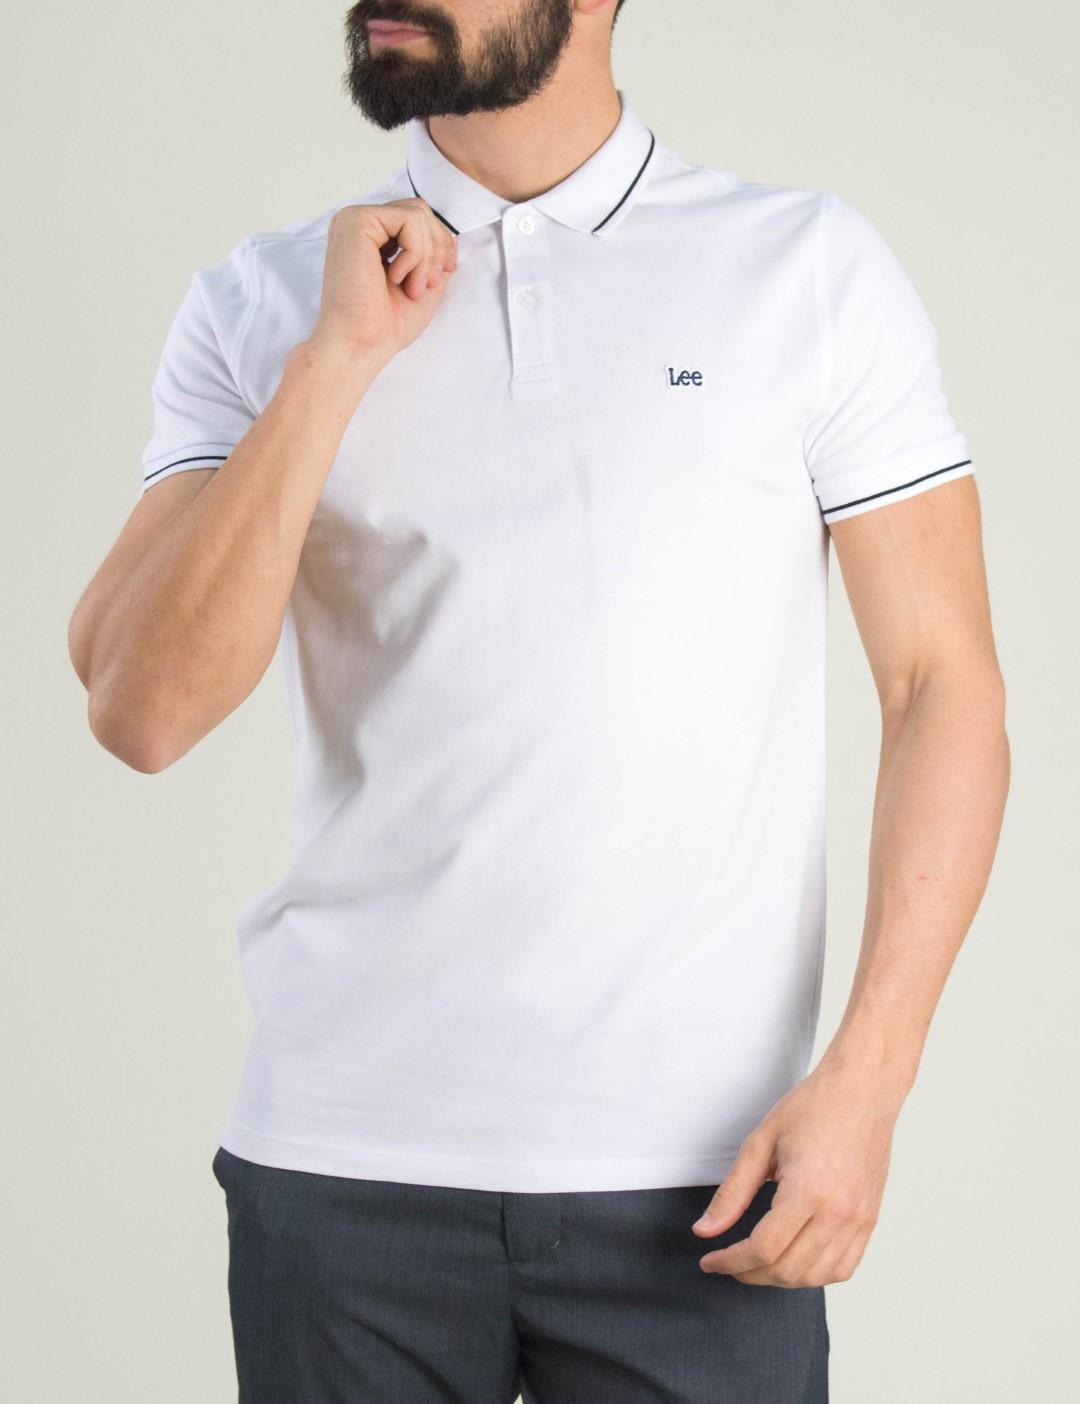 e86be7f767a3 Ανδρική λευκή Polo κοντομάνικη μπλούζα Lee L61ARLLJ